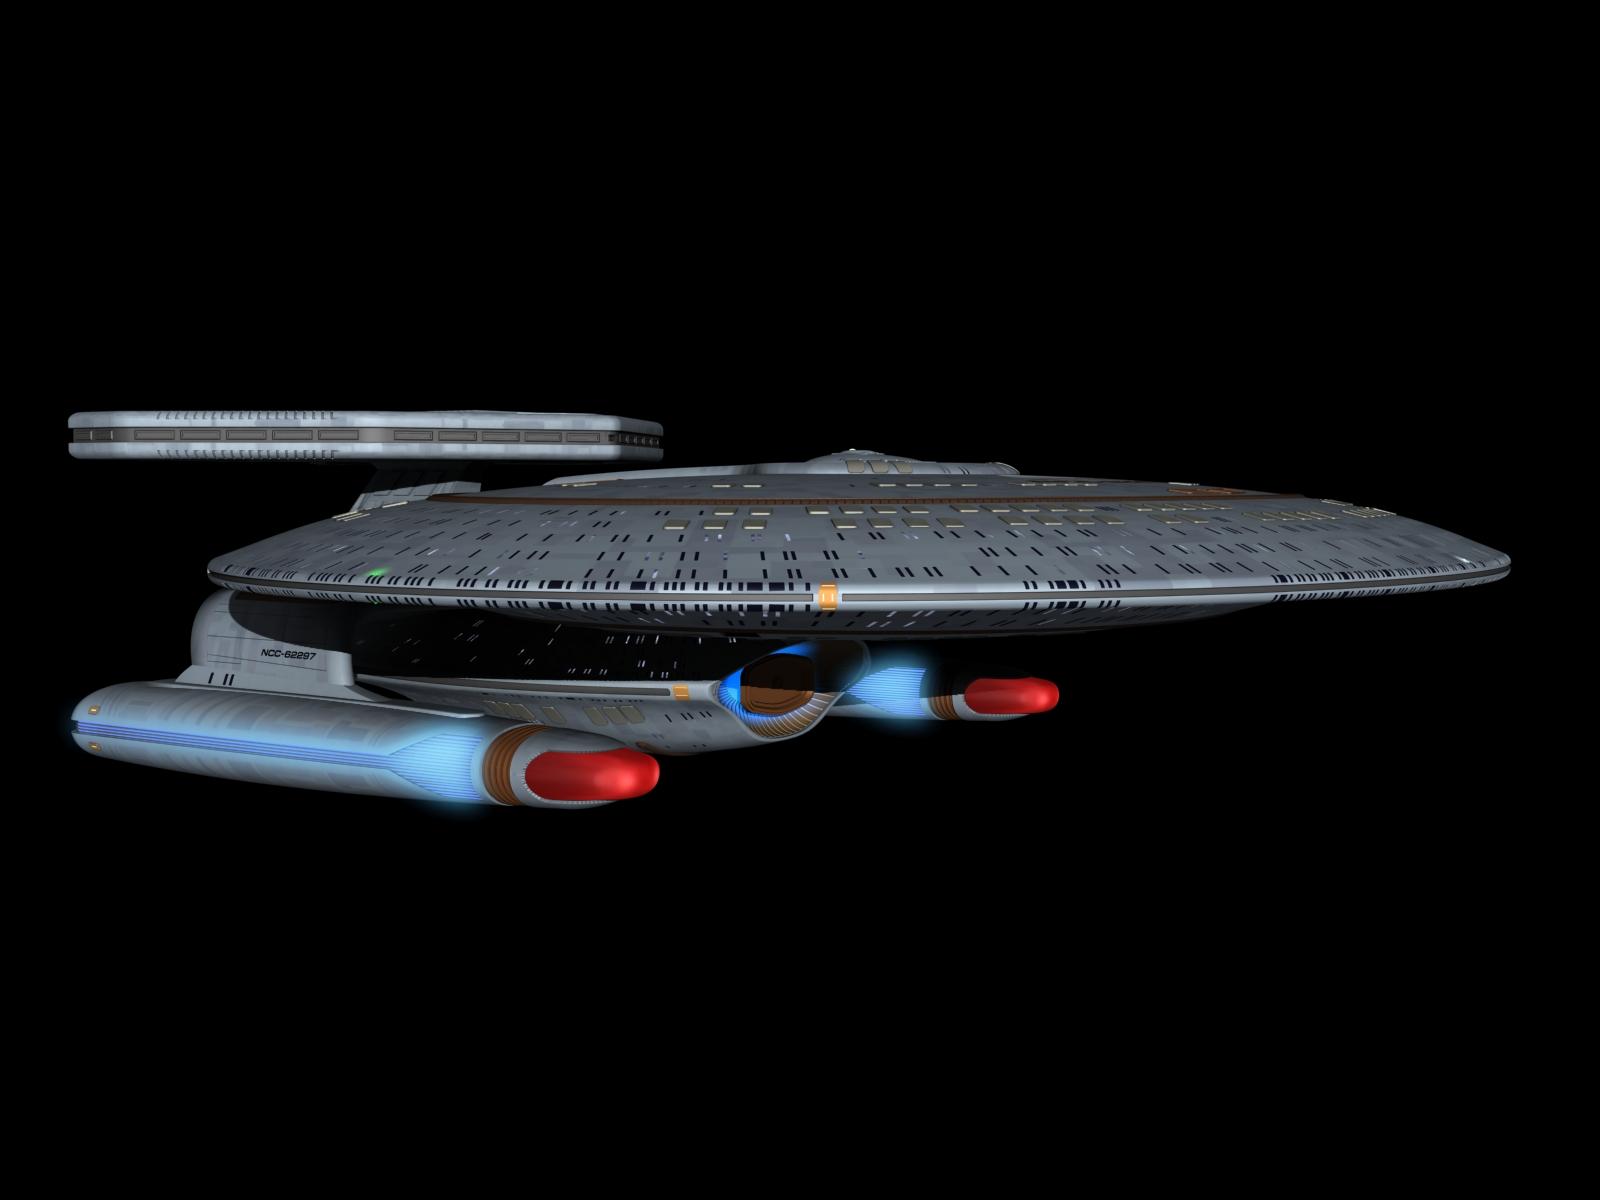 Advanced Nebula class, version 2 by metlesitsfleetyards